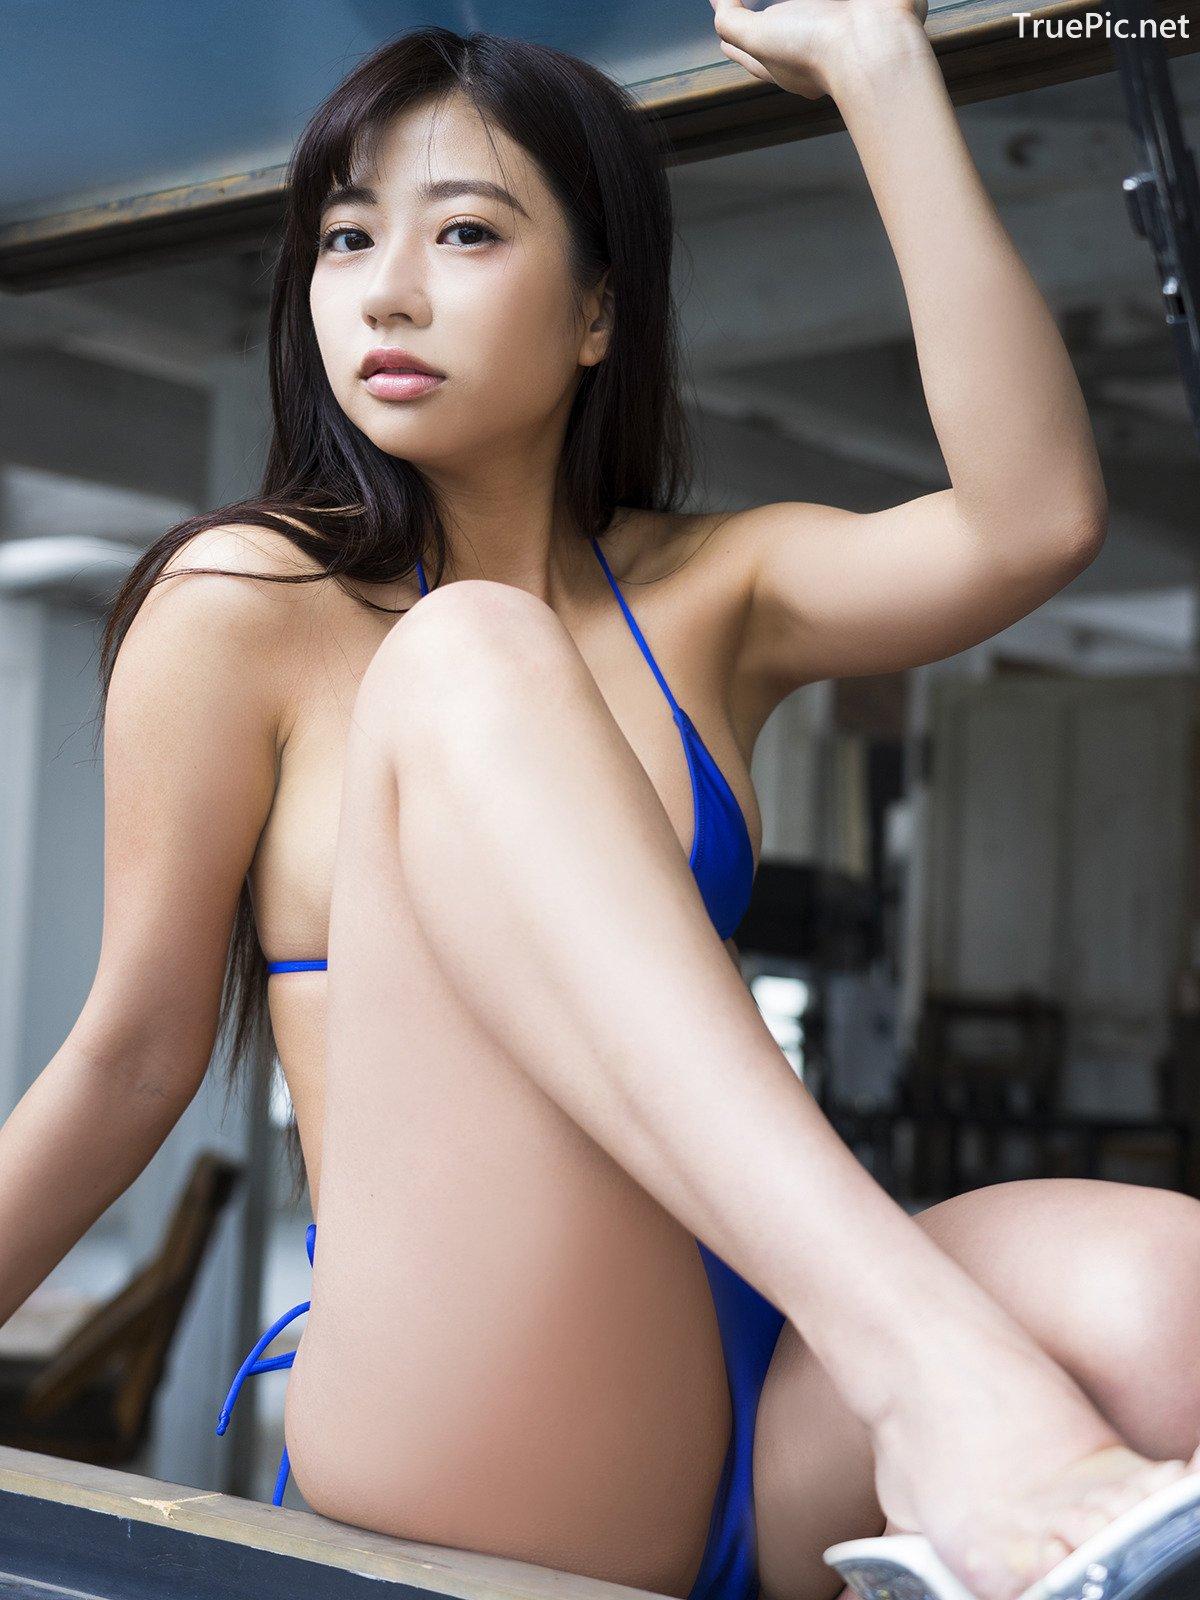 Image Japanese Gravure Model - Sayaka Ohnuki - Maiden Love Story - TruePic.net - Picture-36